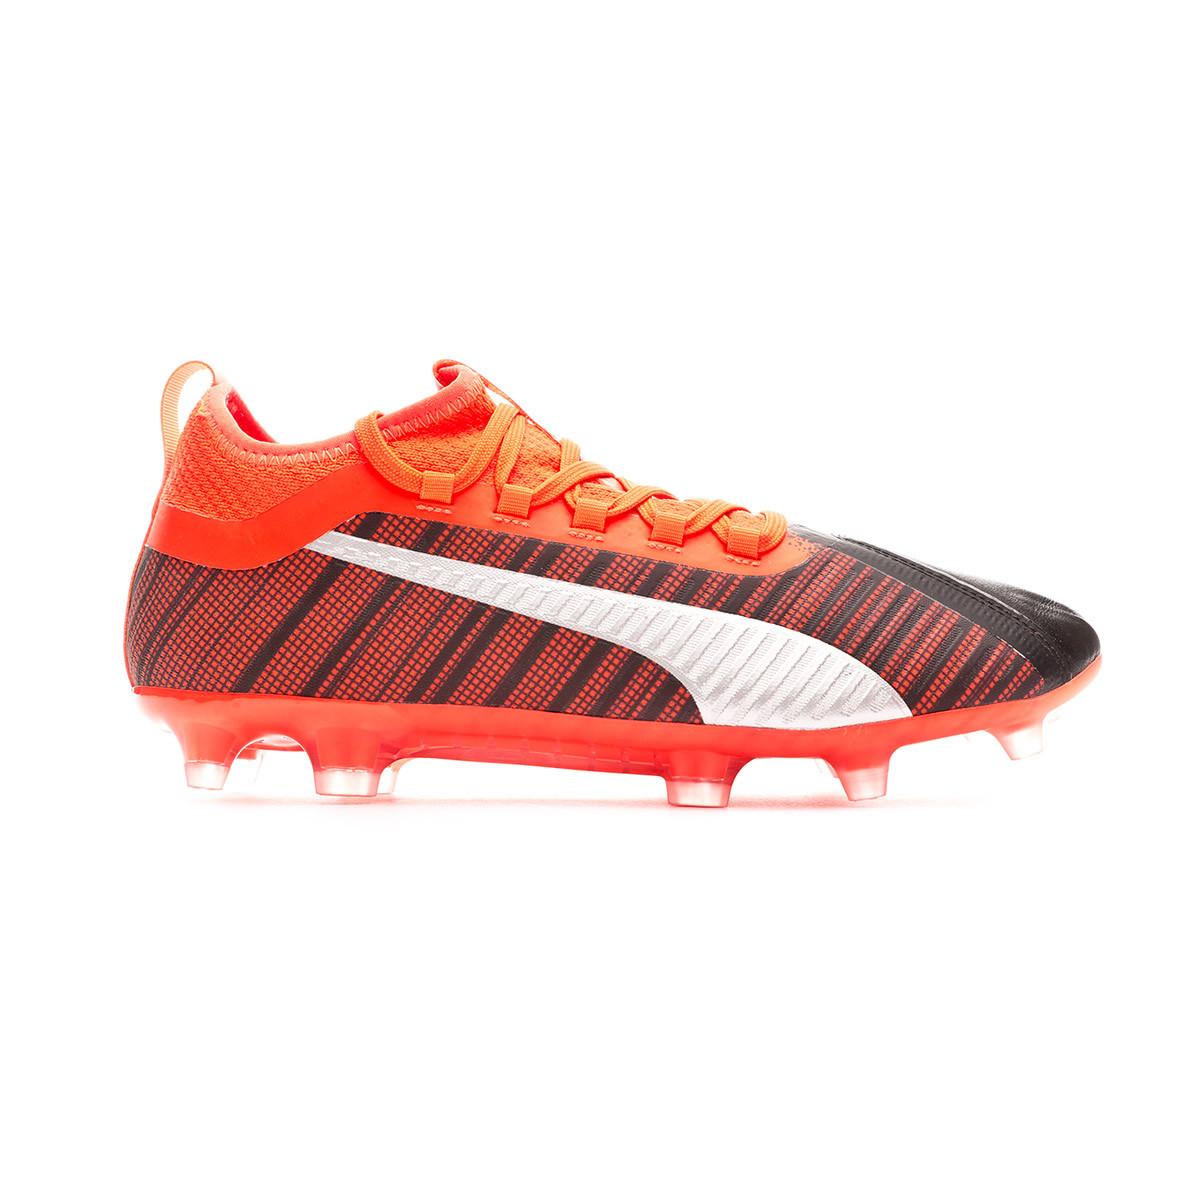 Chaussure Red 5 One 2 Black Foot Nrgy De Fgag Puma Aged m0N8wn